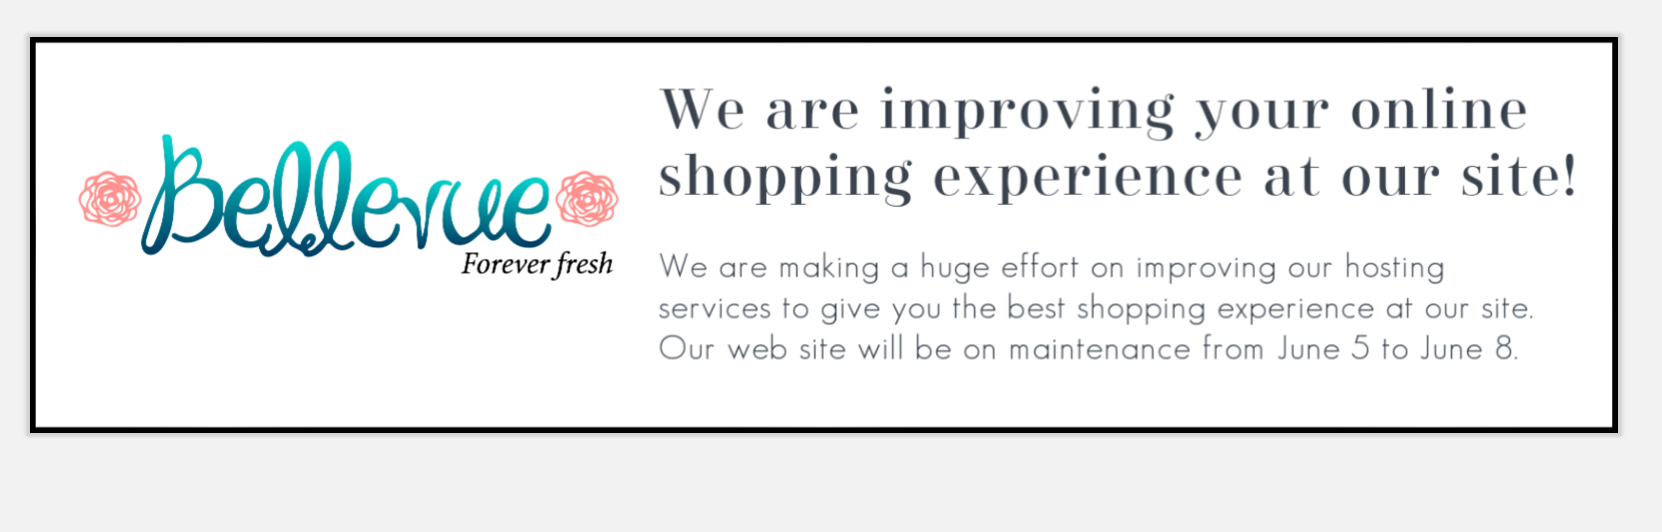 Bellevue Roses Improving Web Site